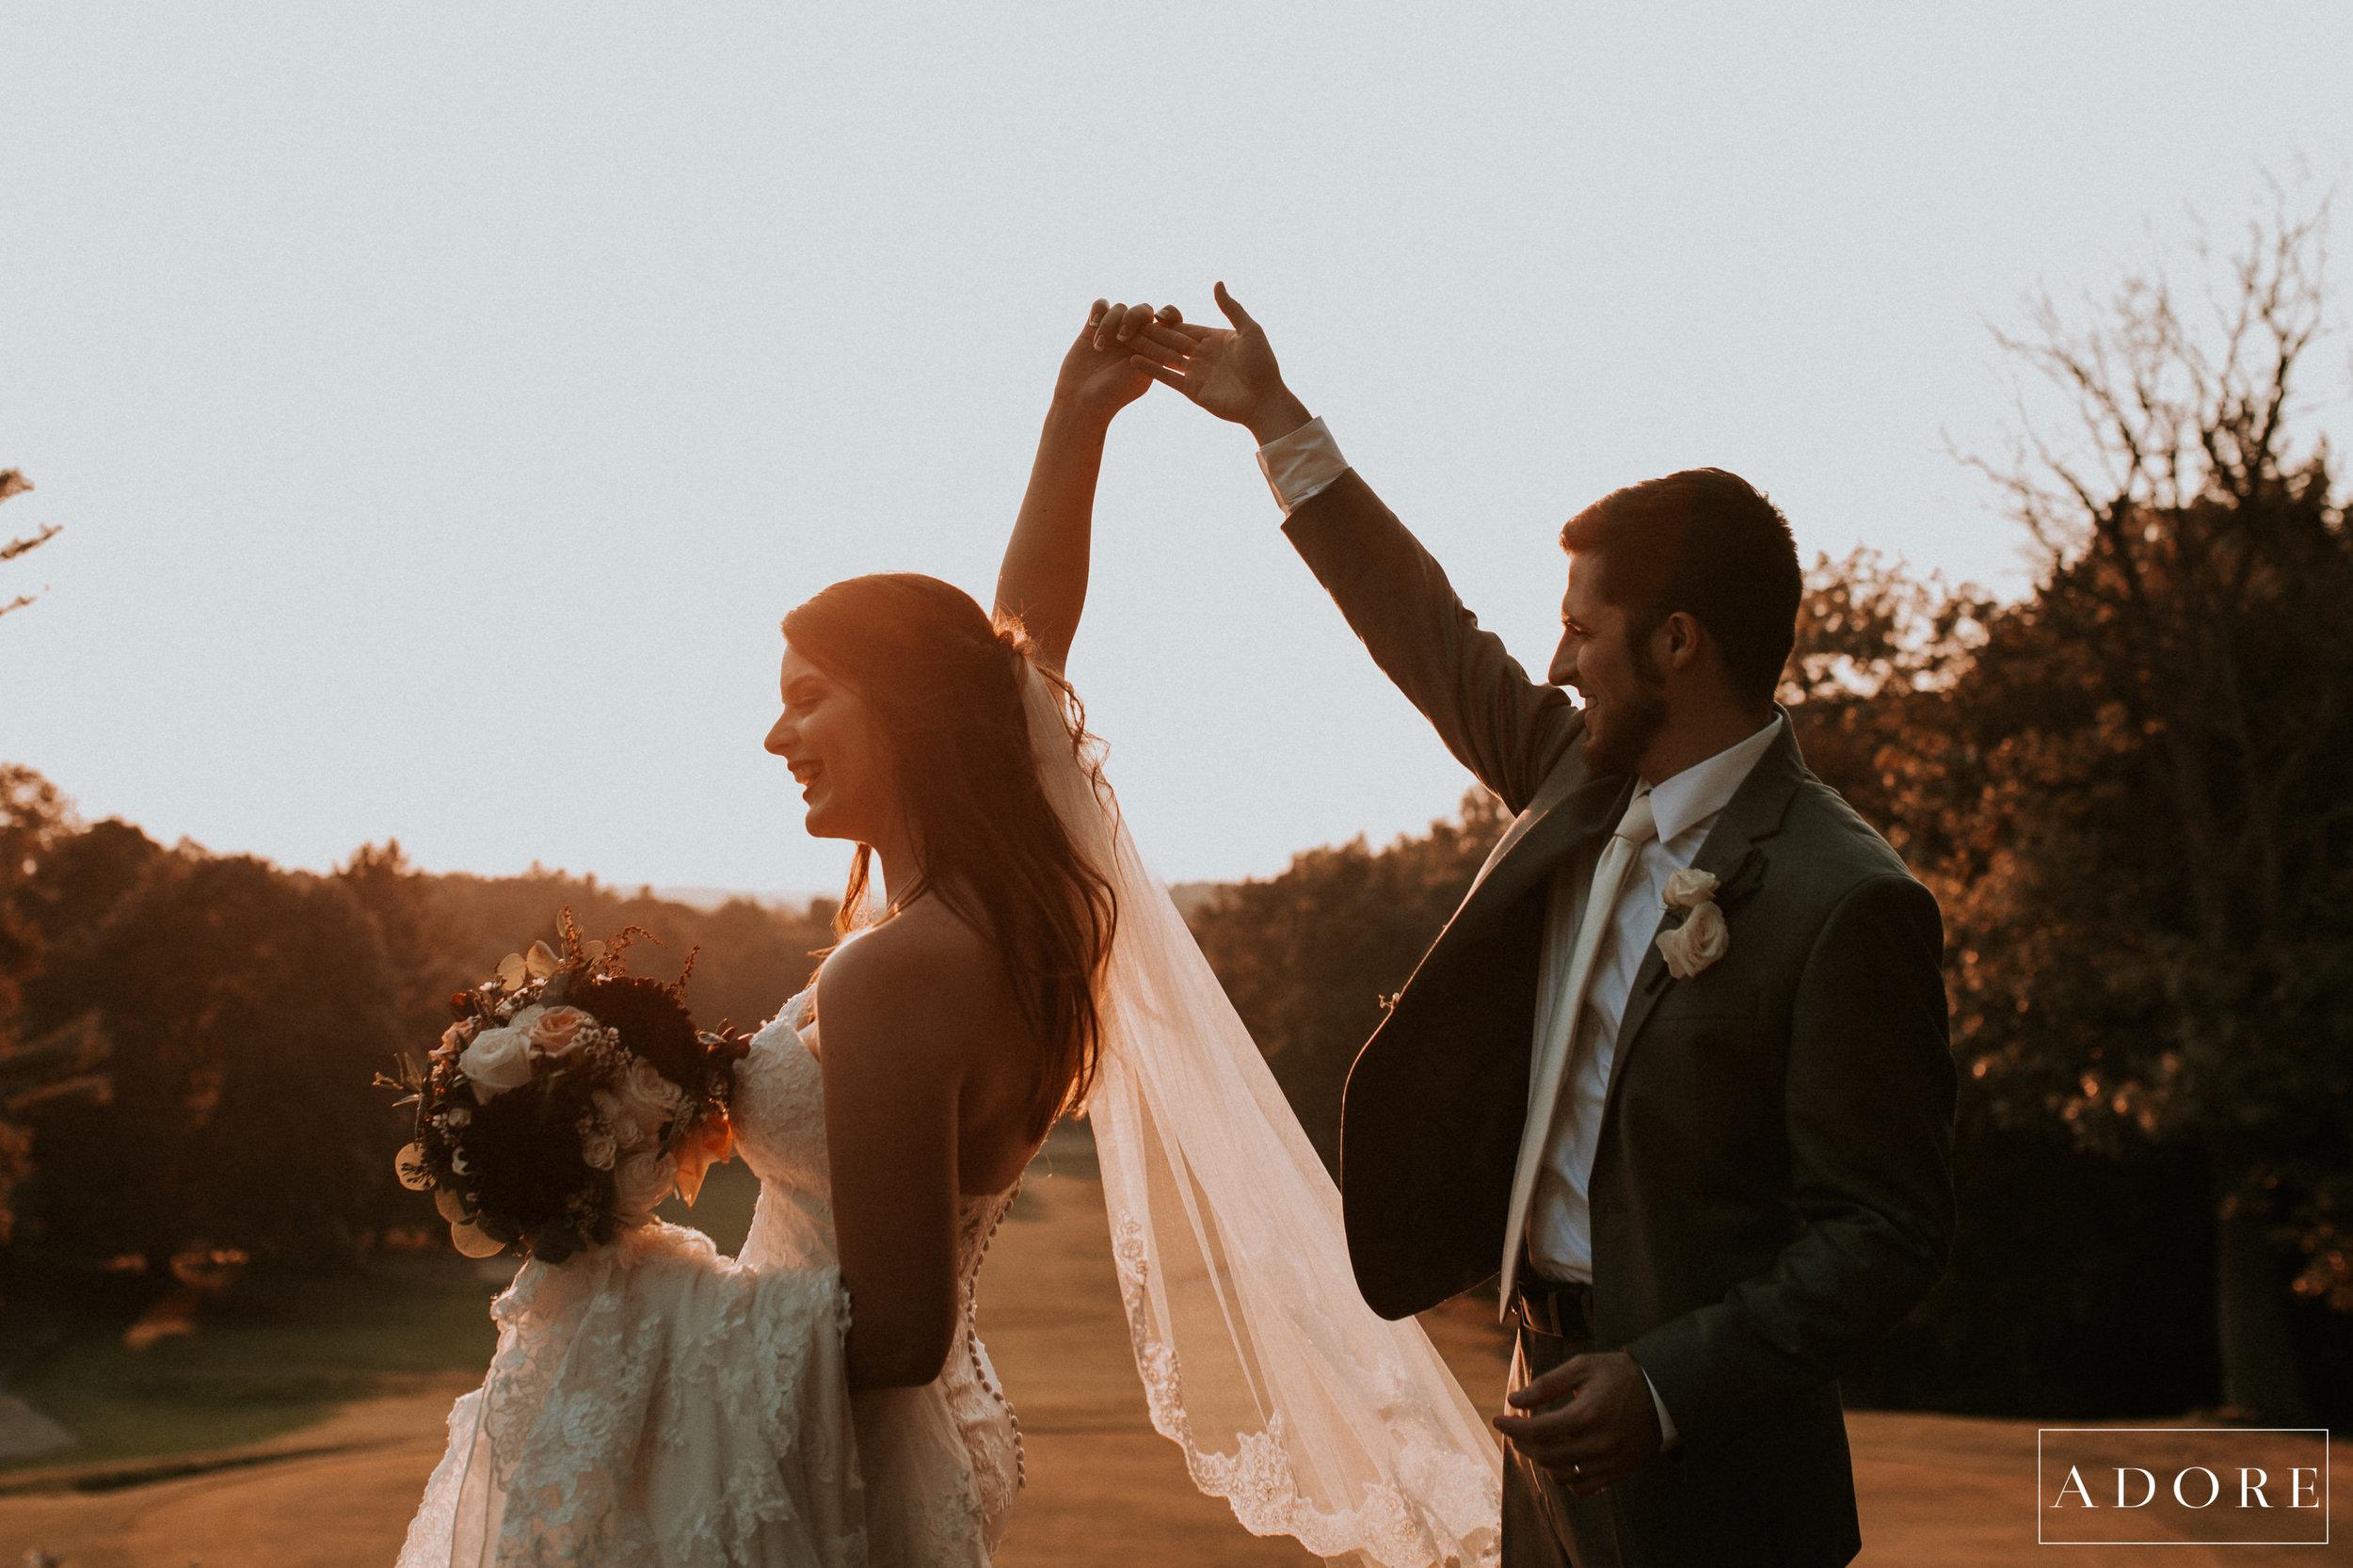 Adore Wedding Photography-25336.jpg